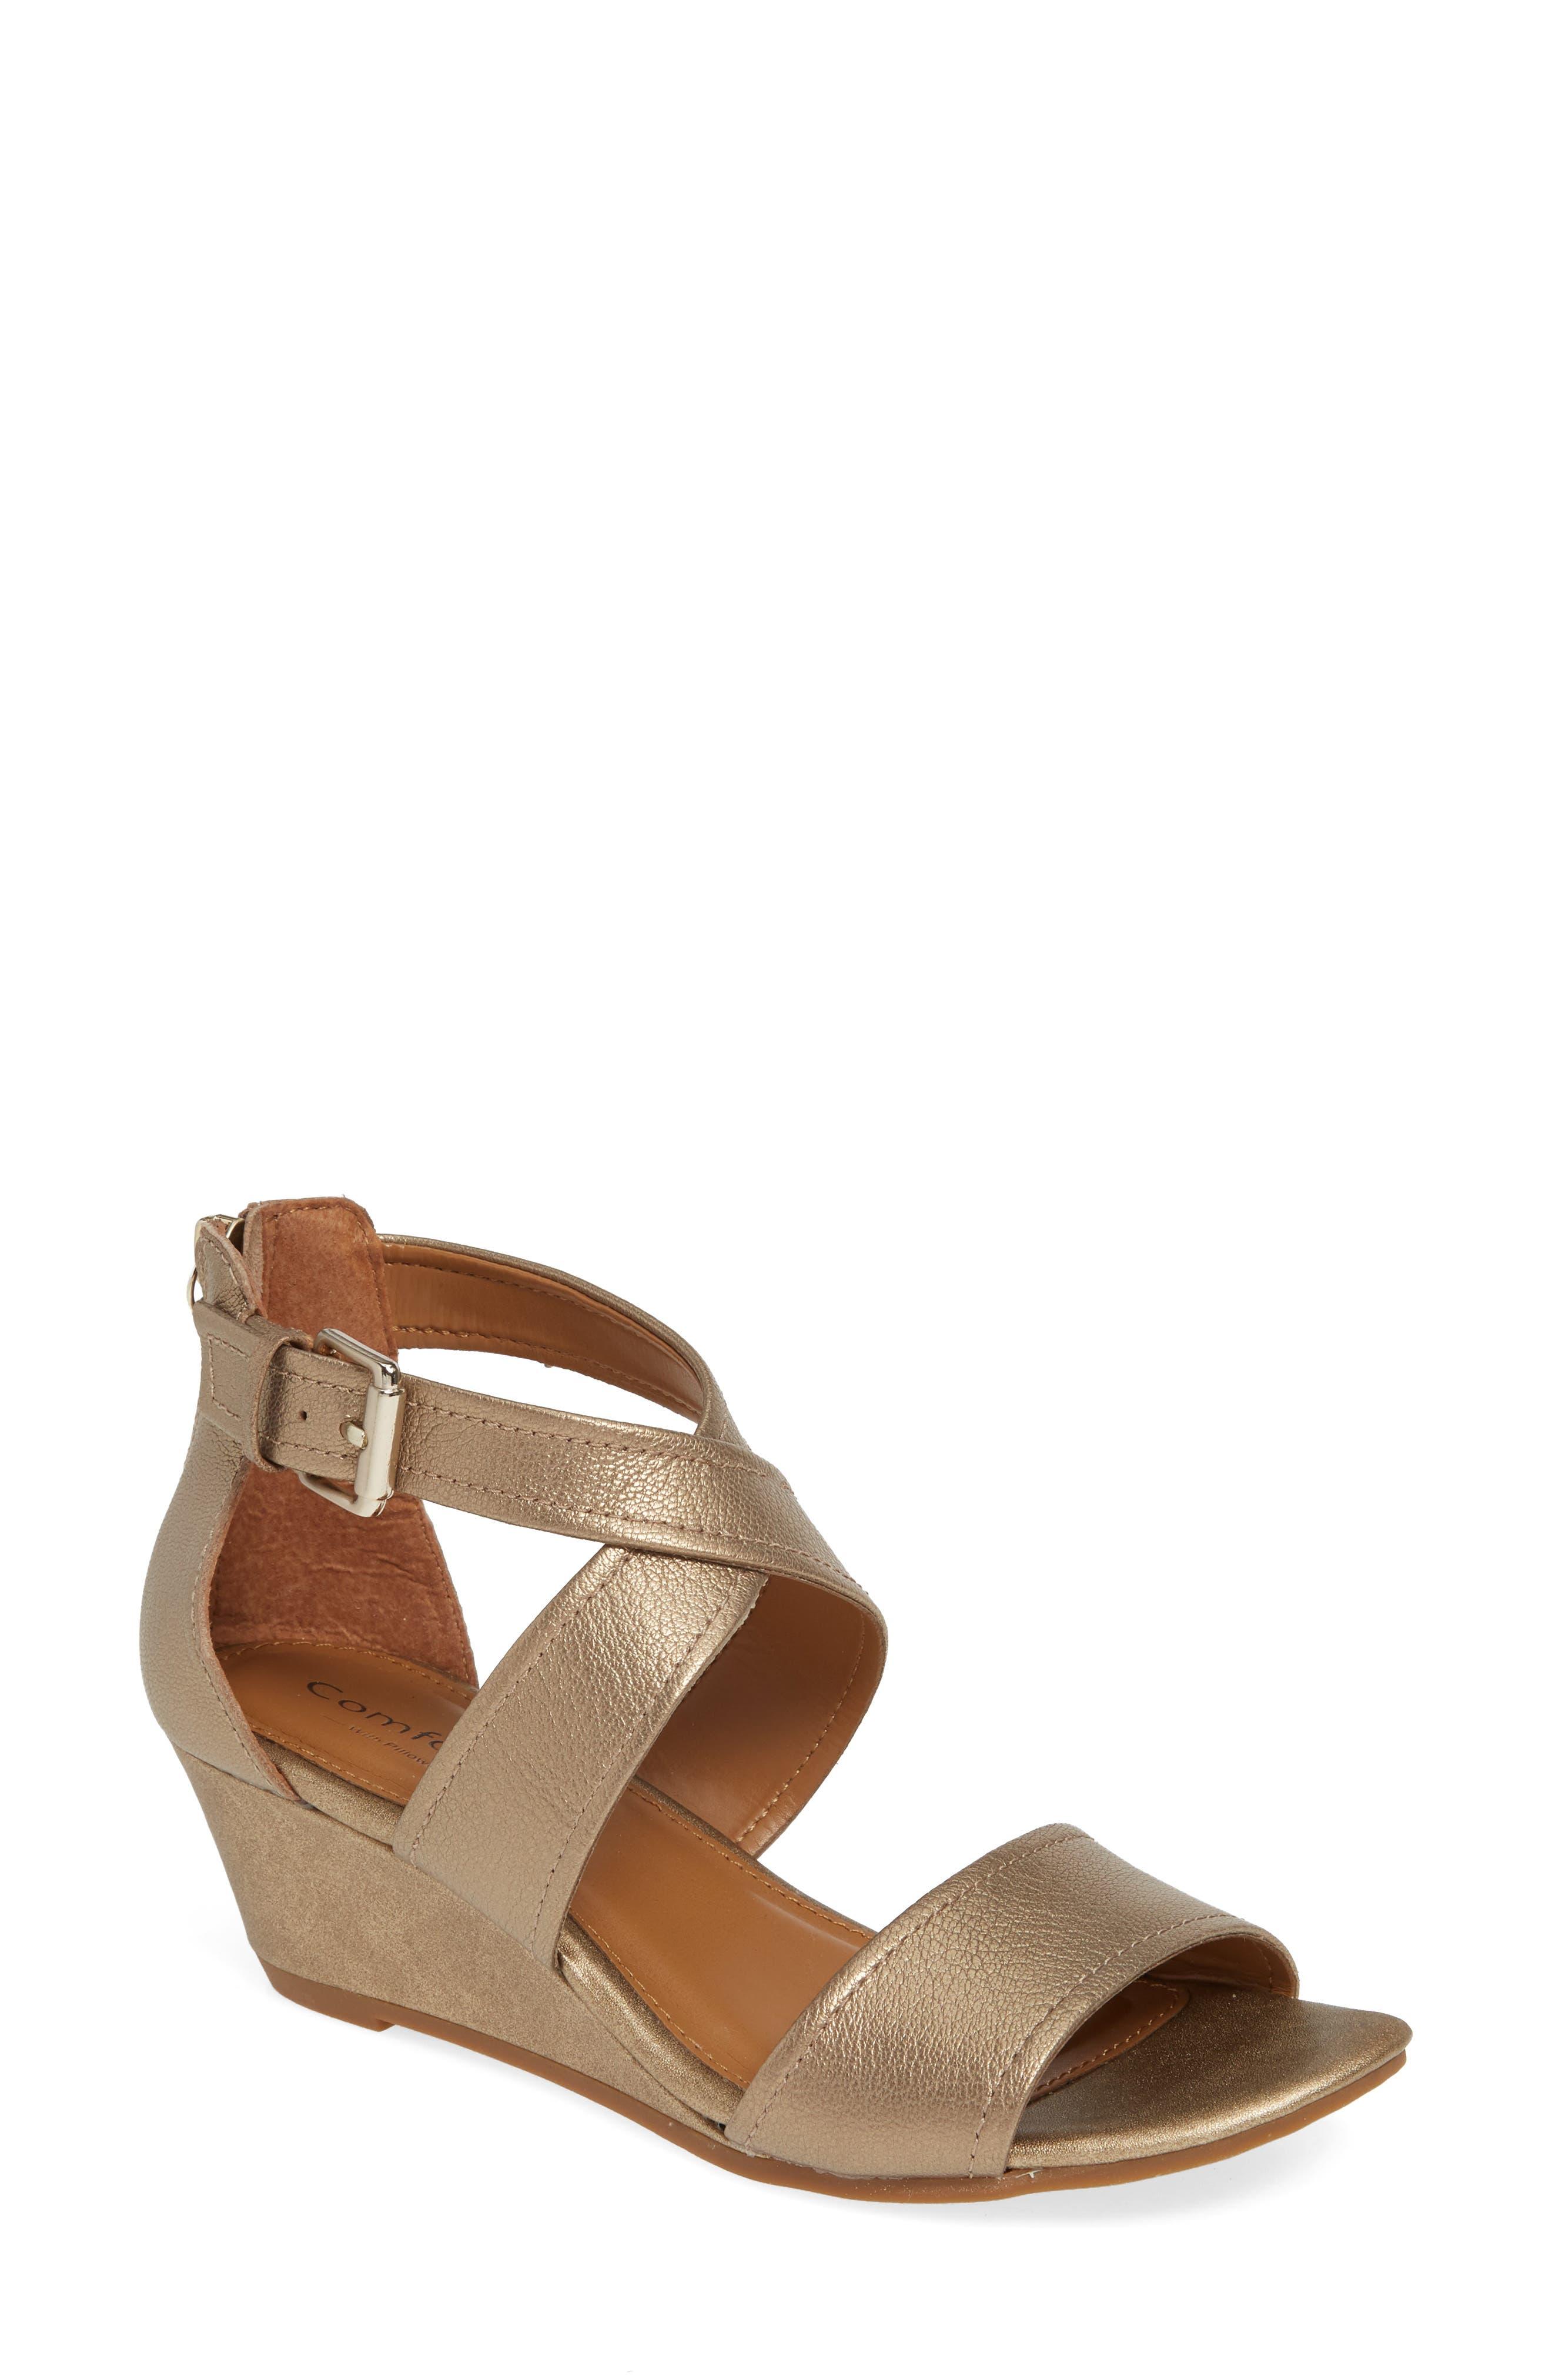 Rabea Wedge Sandal